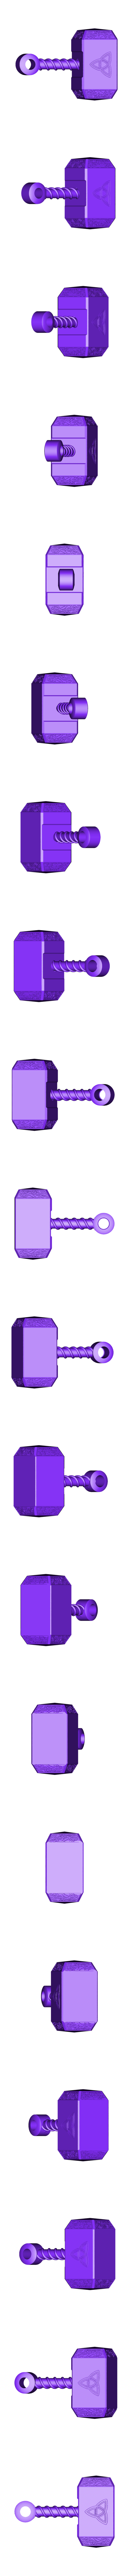 Thorpendandzbrush3.stl Download free STL file Thorhammerpendant • 3D printable template, cchampjr